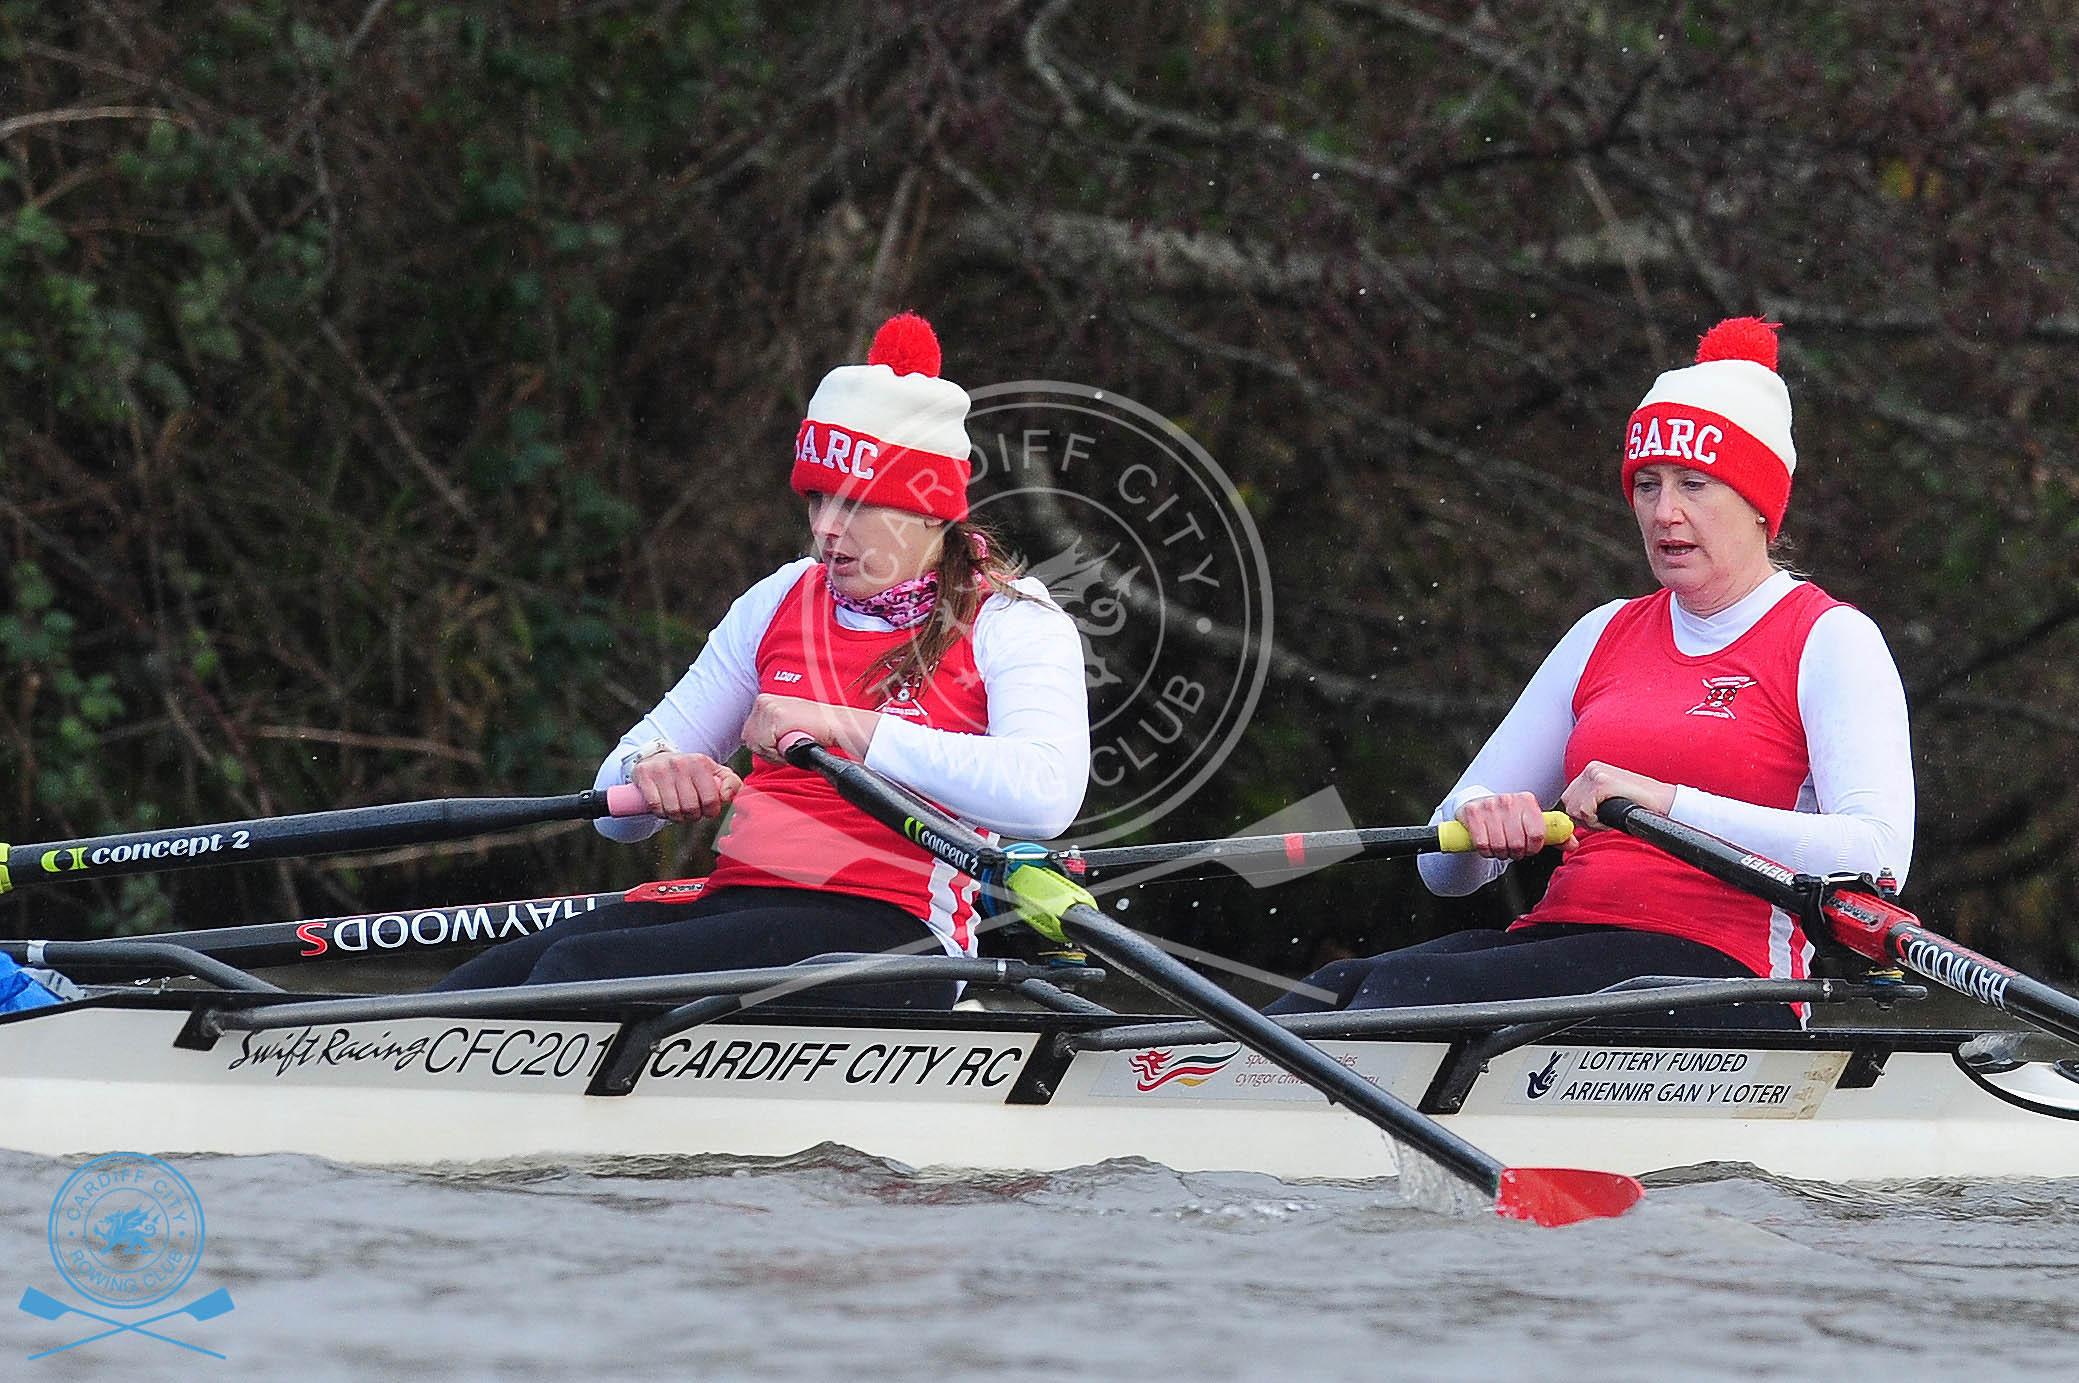 DW_280119_Cardiff_City_Rowing_302.jpg